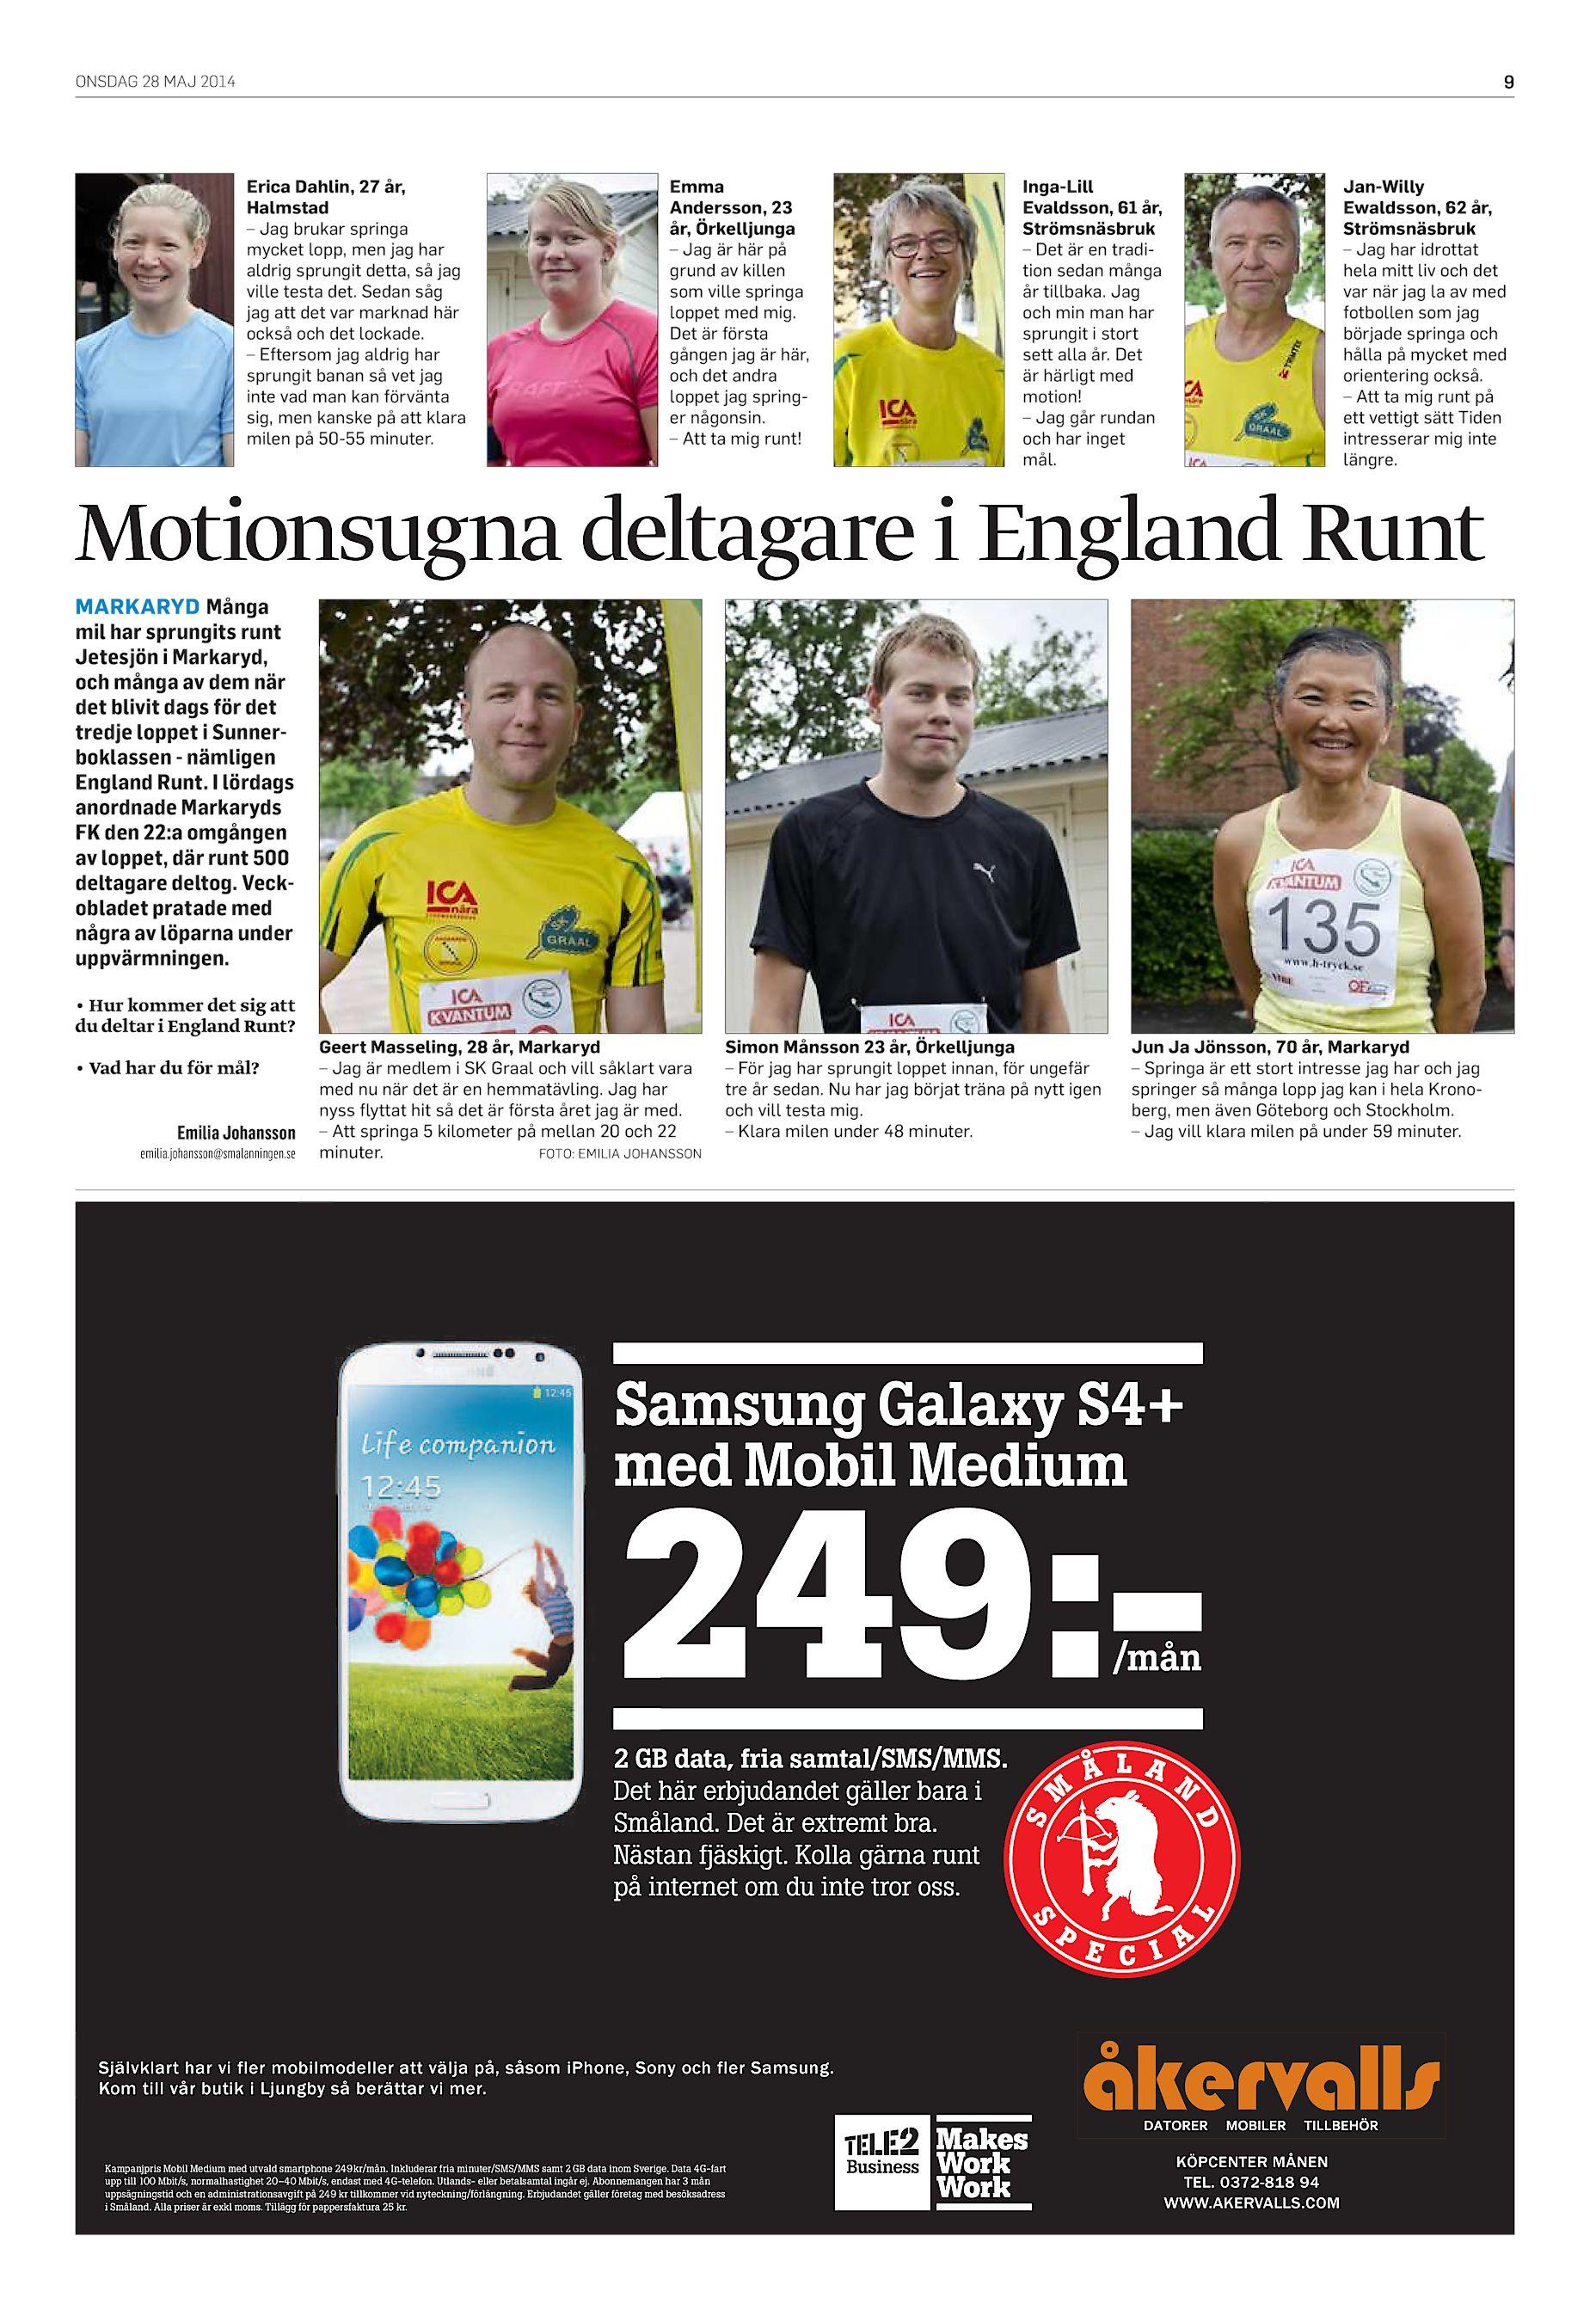 Veckobladet SV-20140528 (endast text) be3e38635da7d